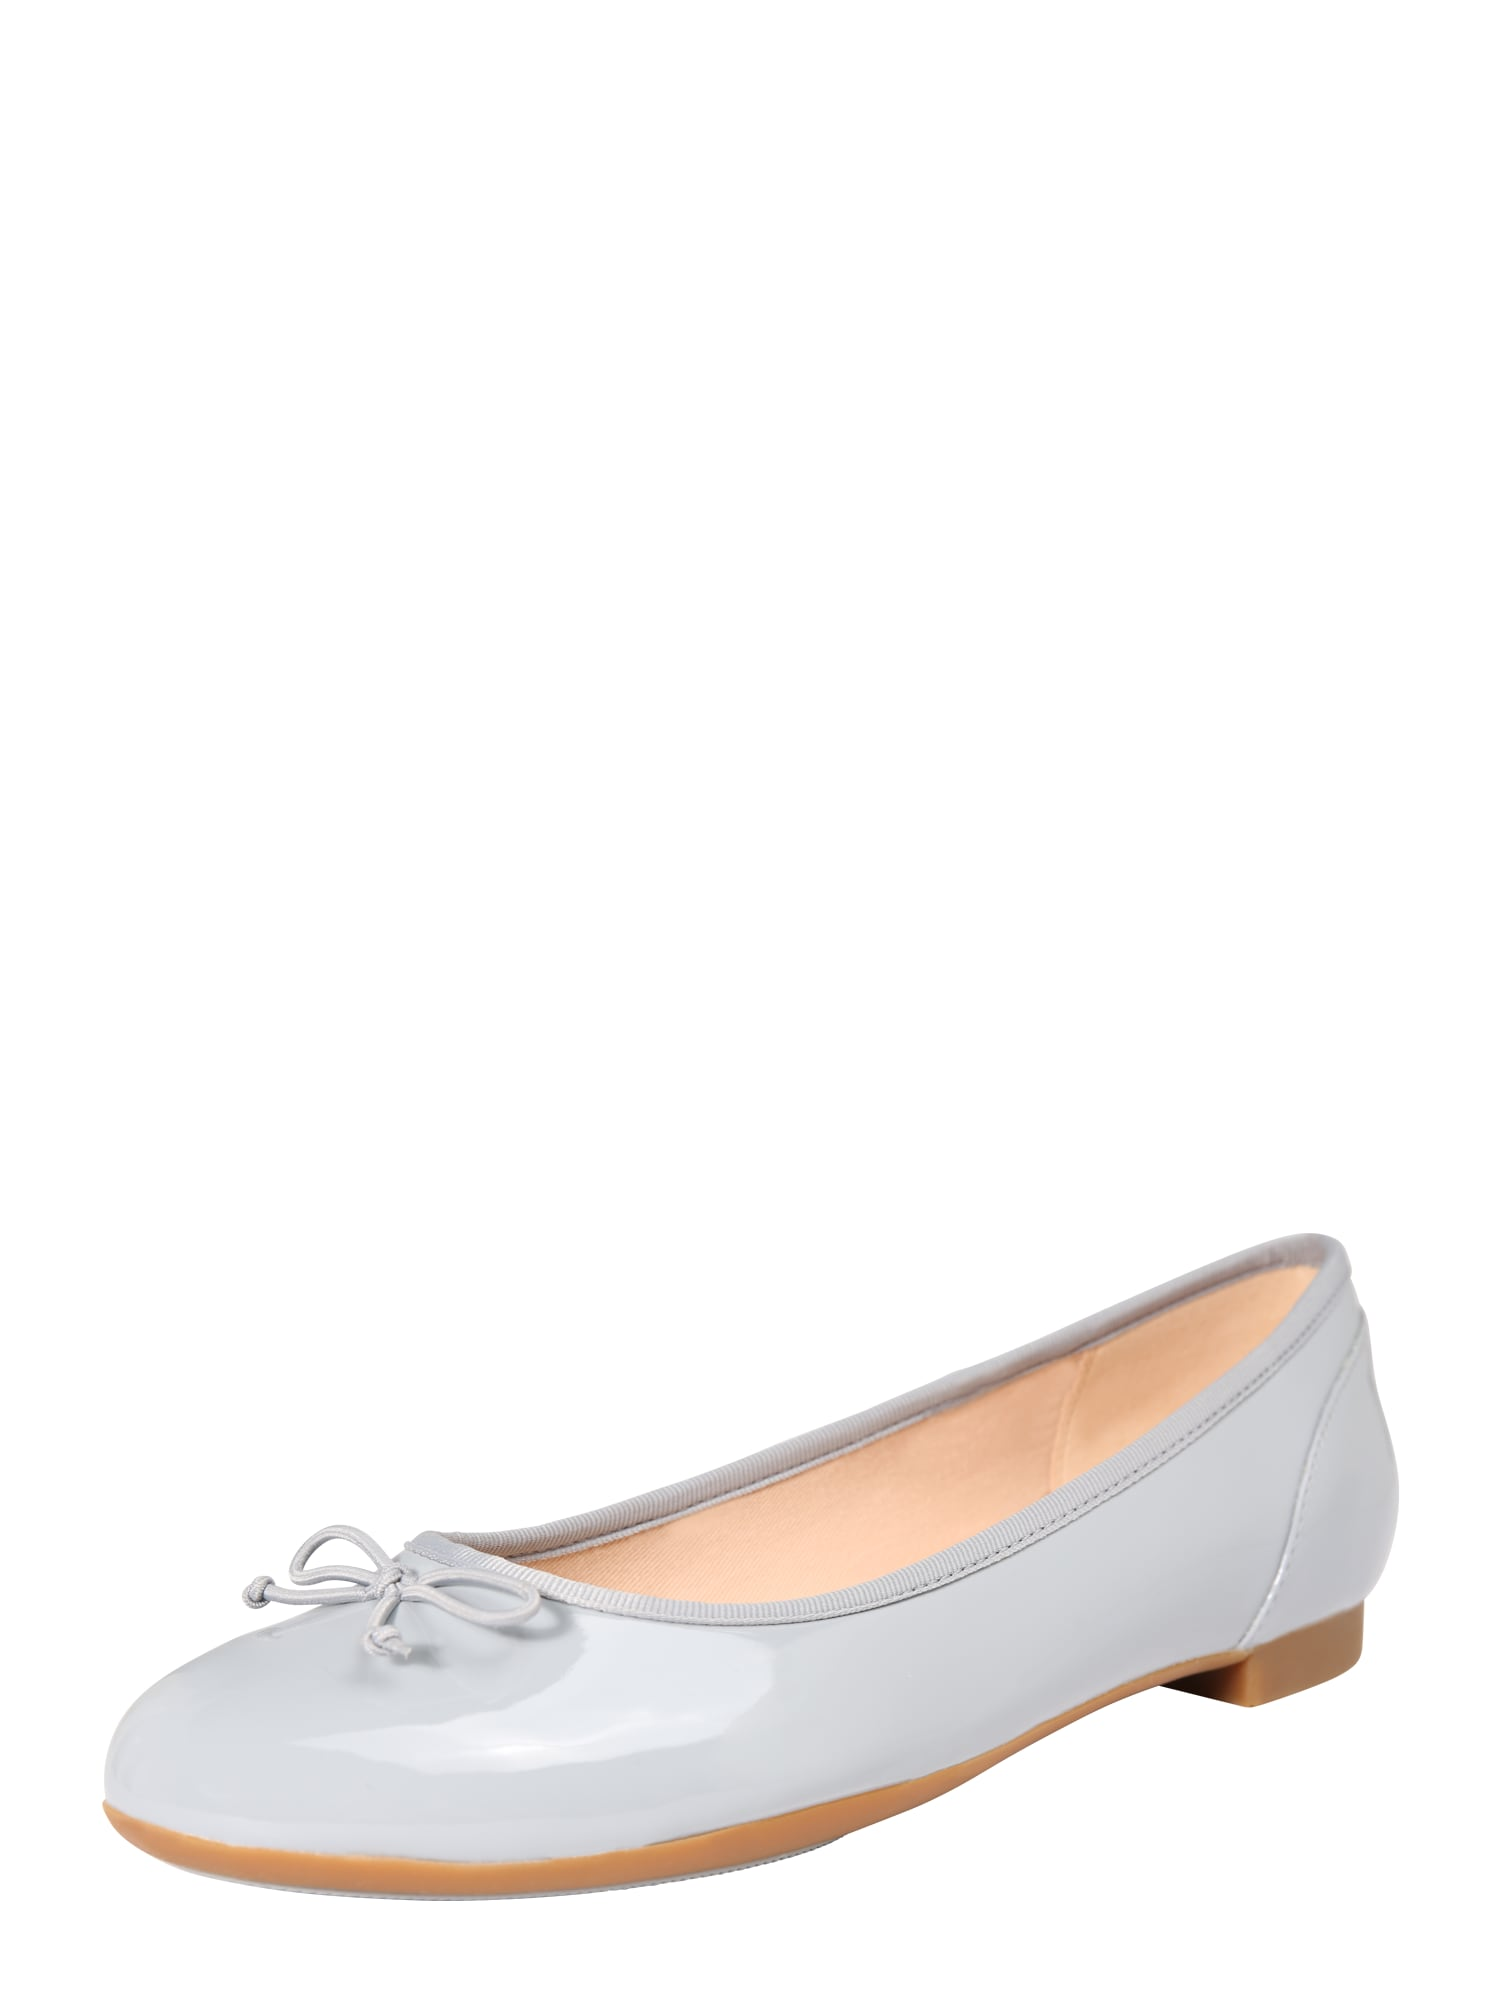 Baleríny Couture bloom šedá CLARKS